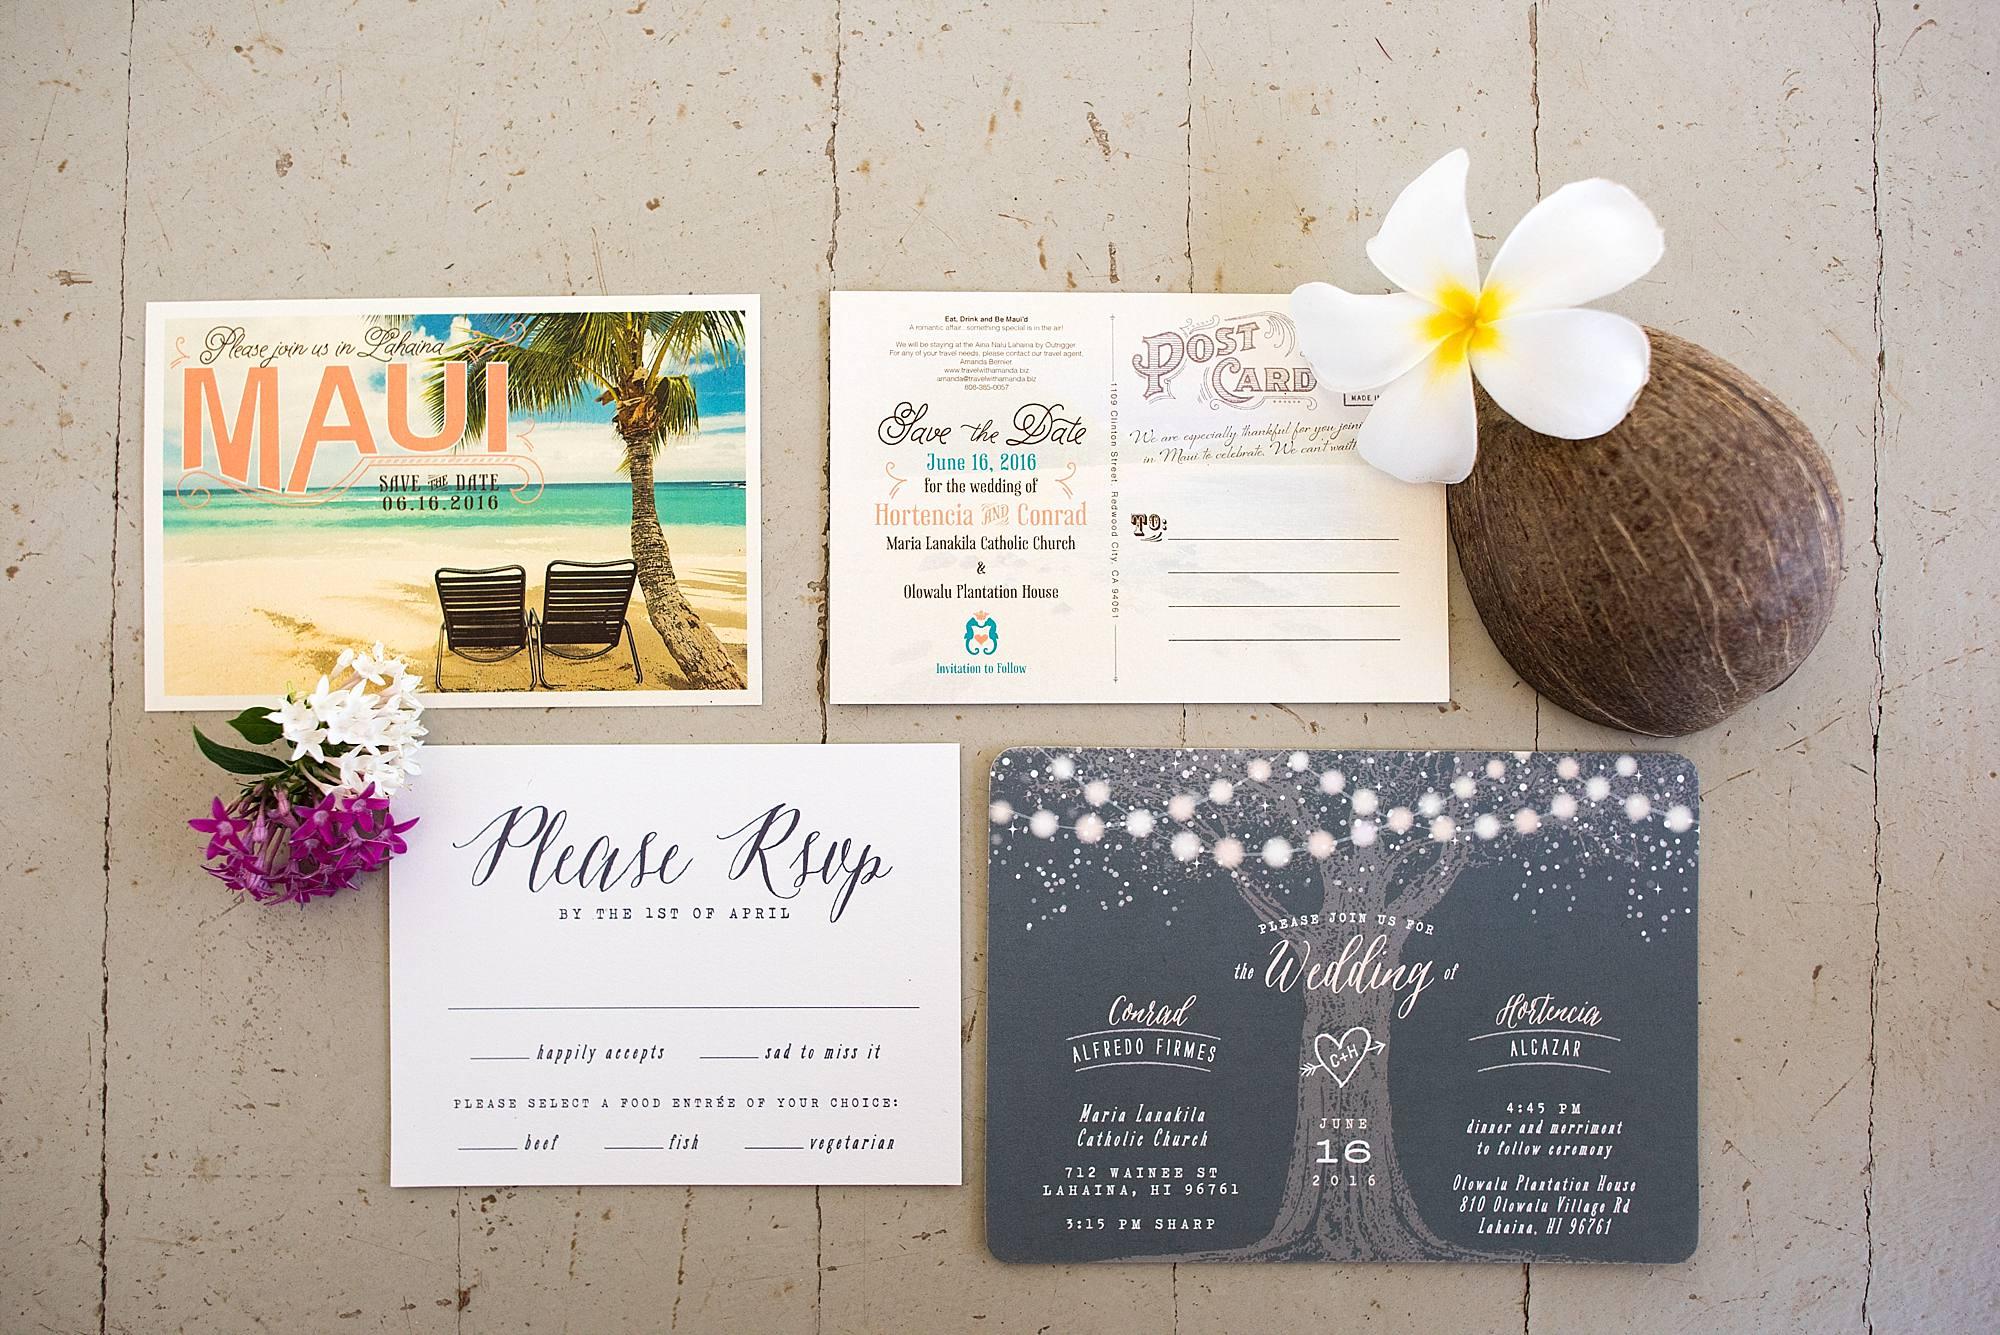 Custom Maui wedding stationary